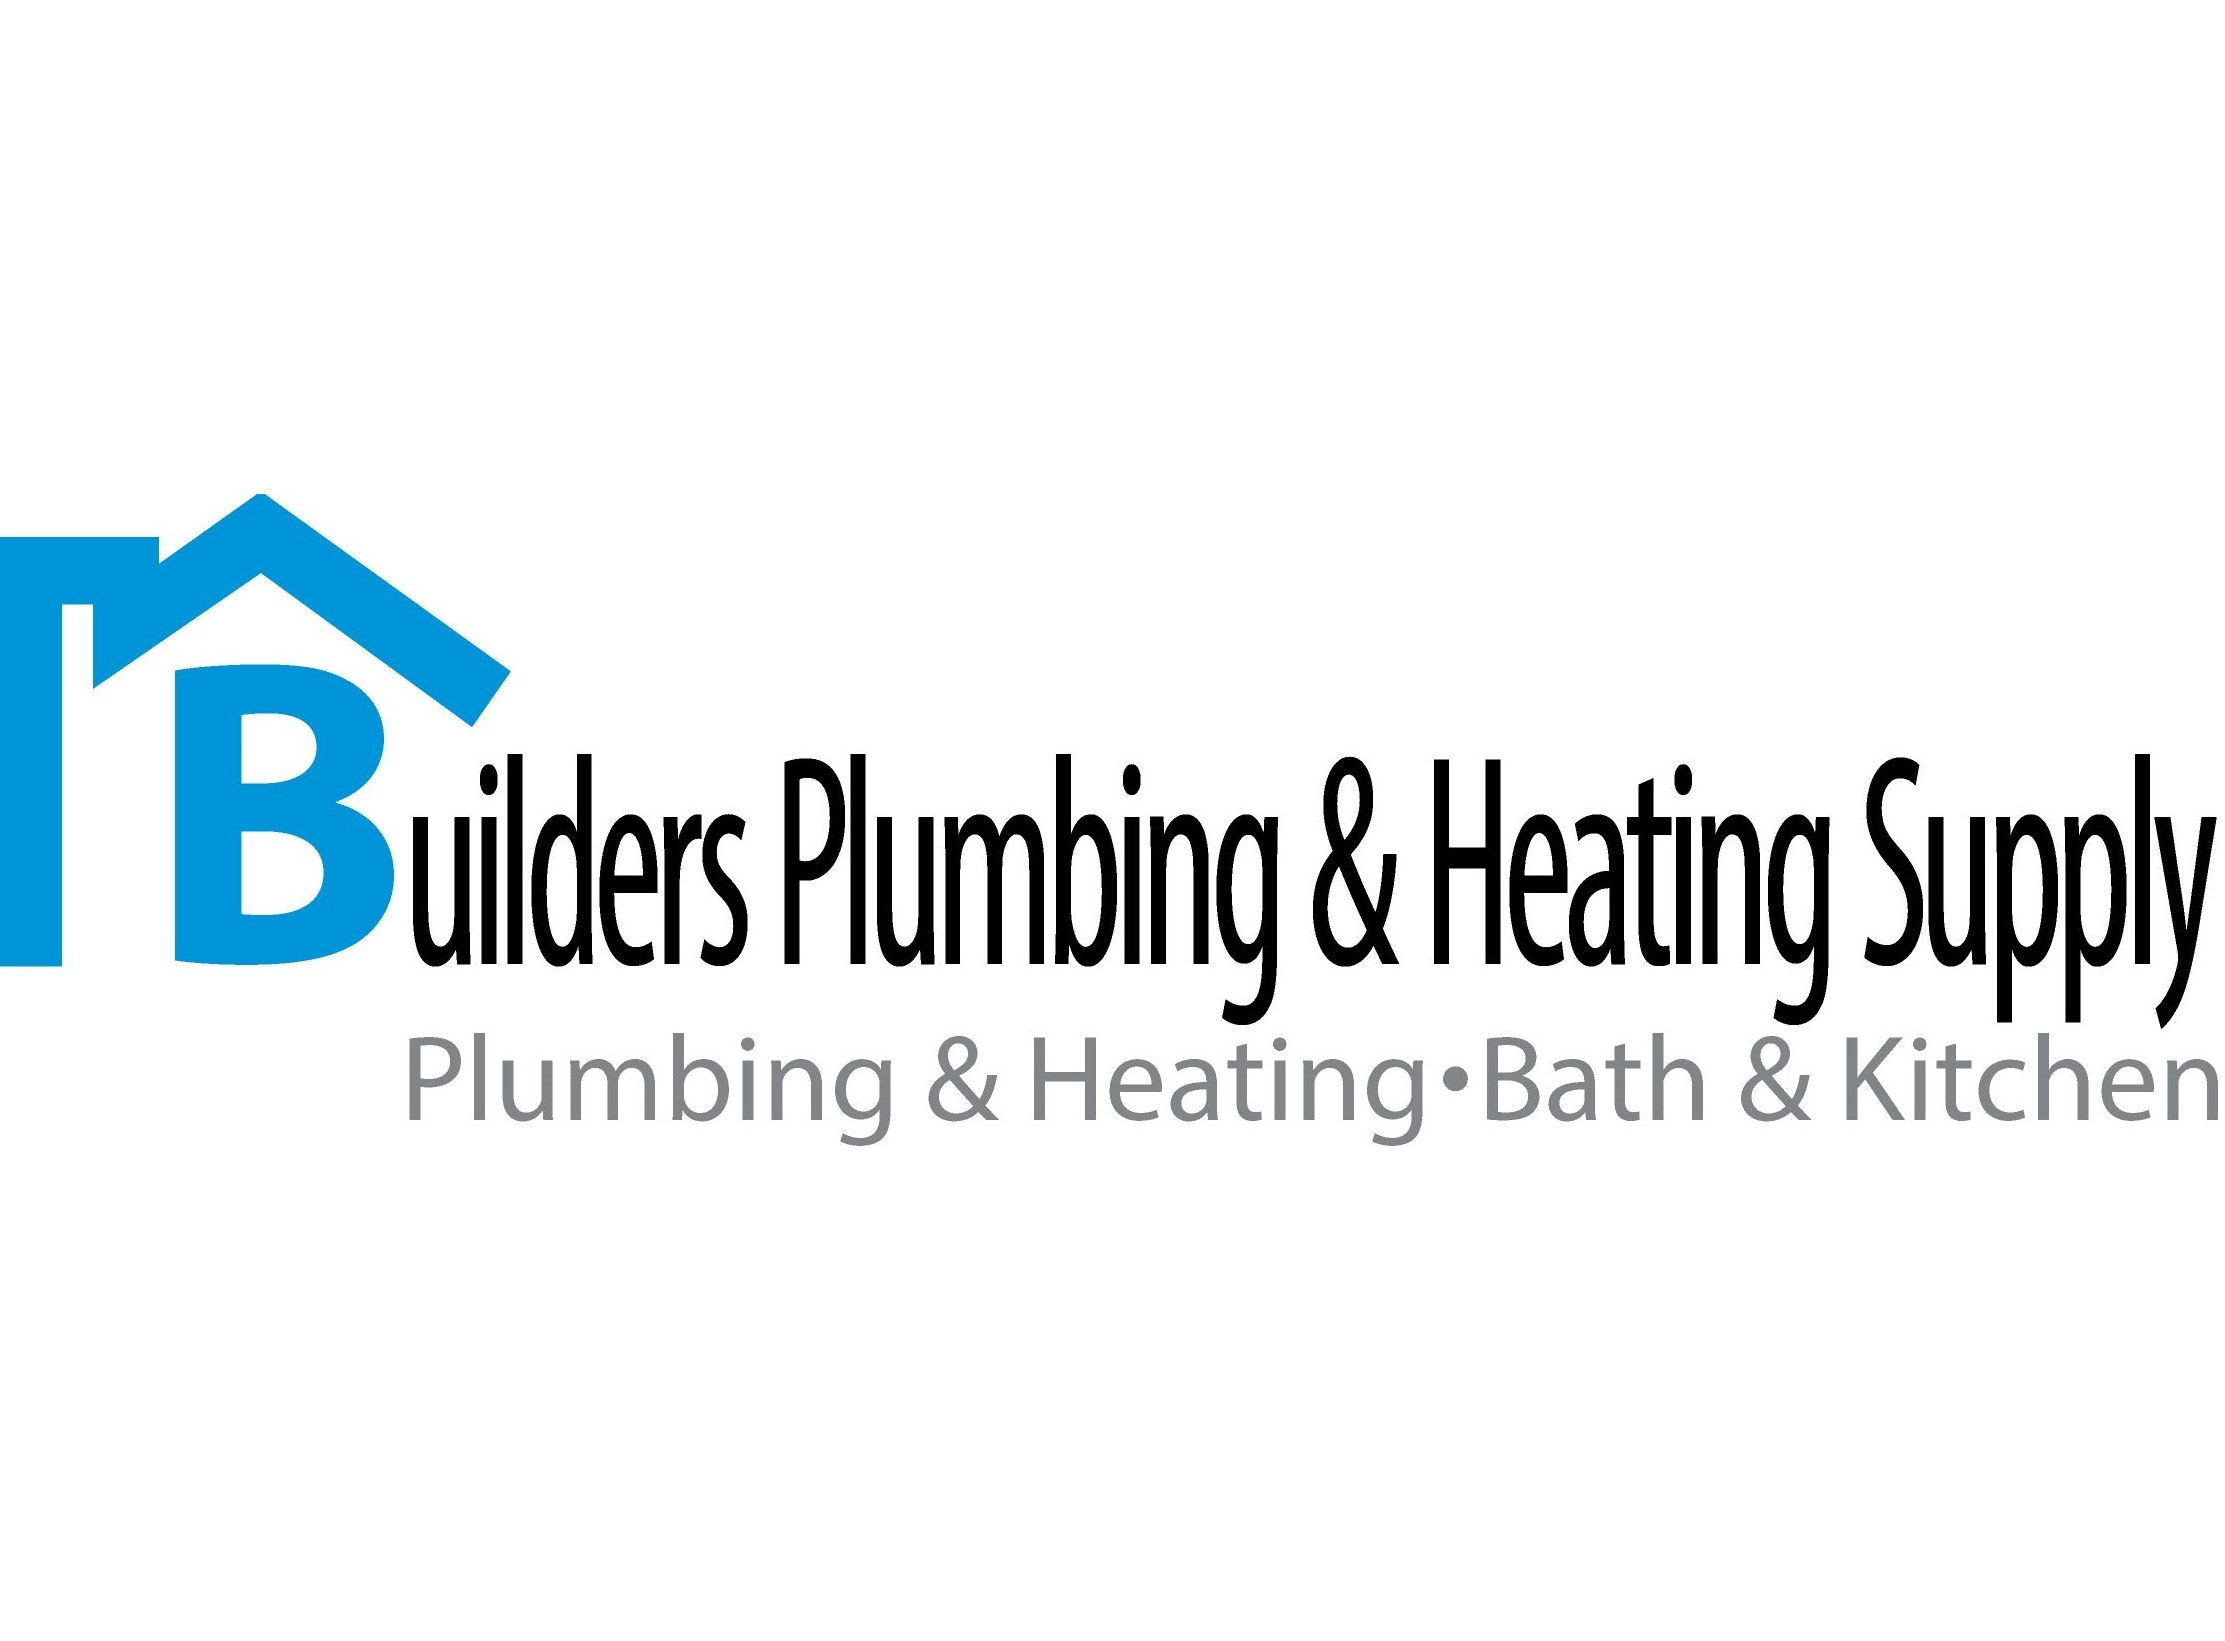 Logo for Builders Plumbing & Heating Supply